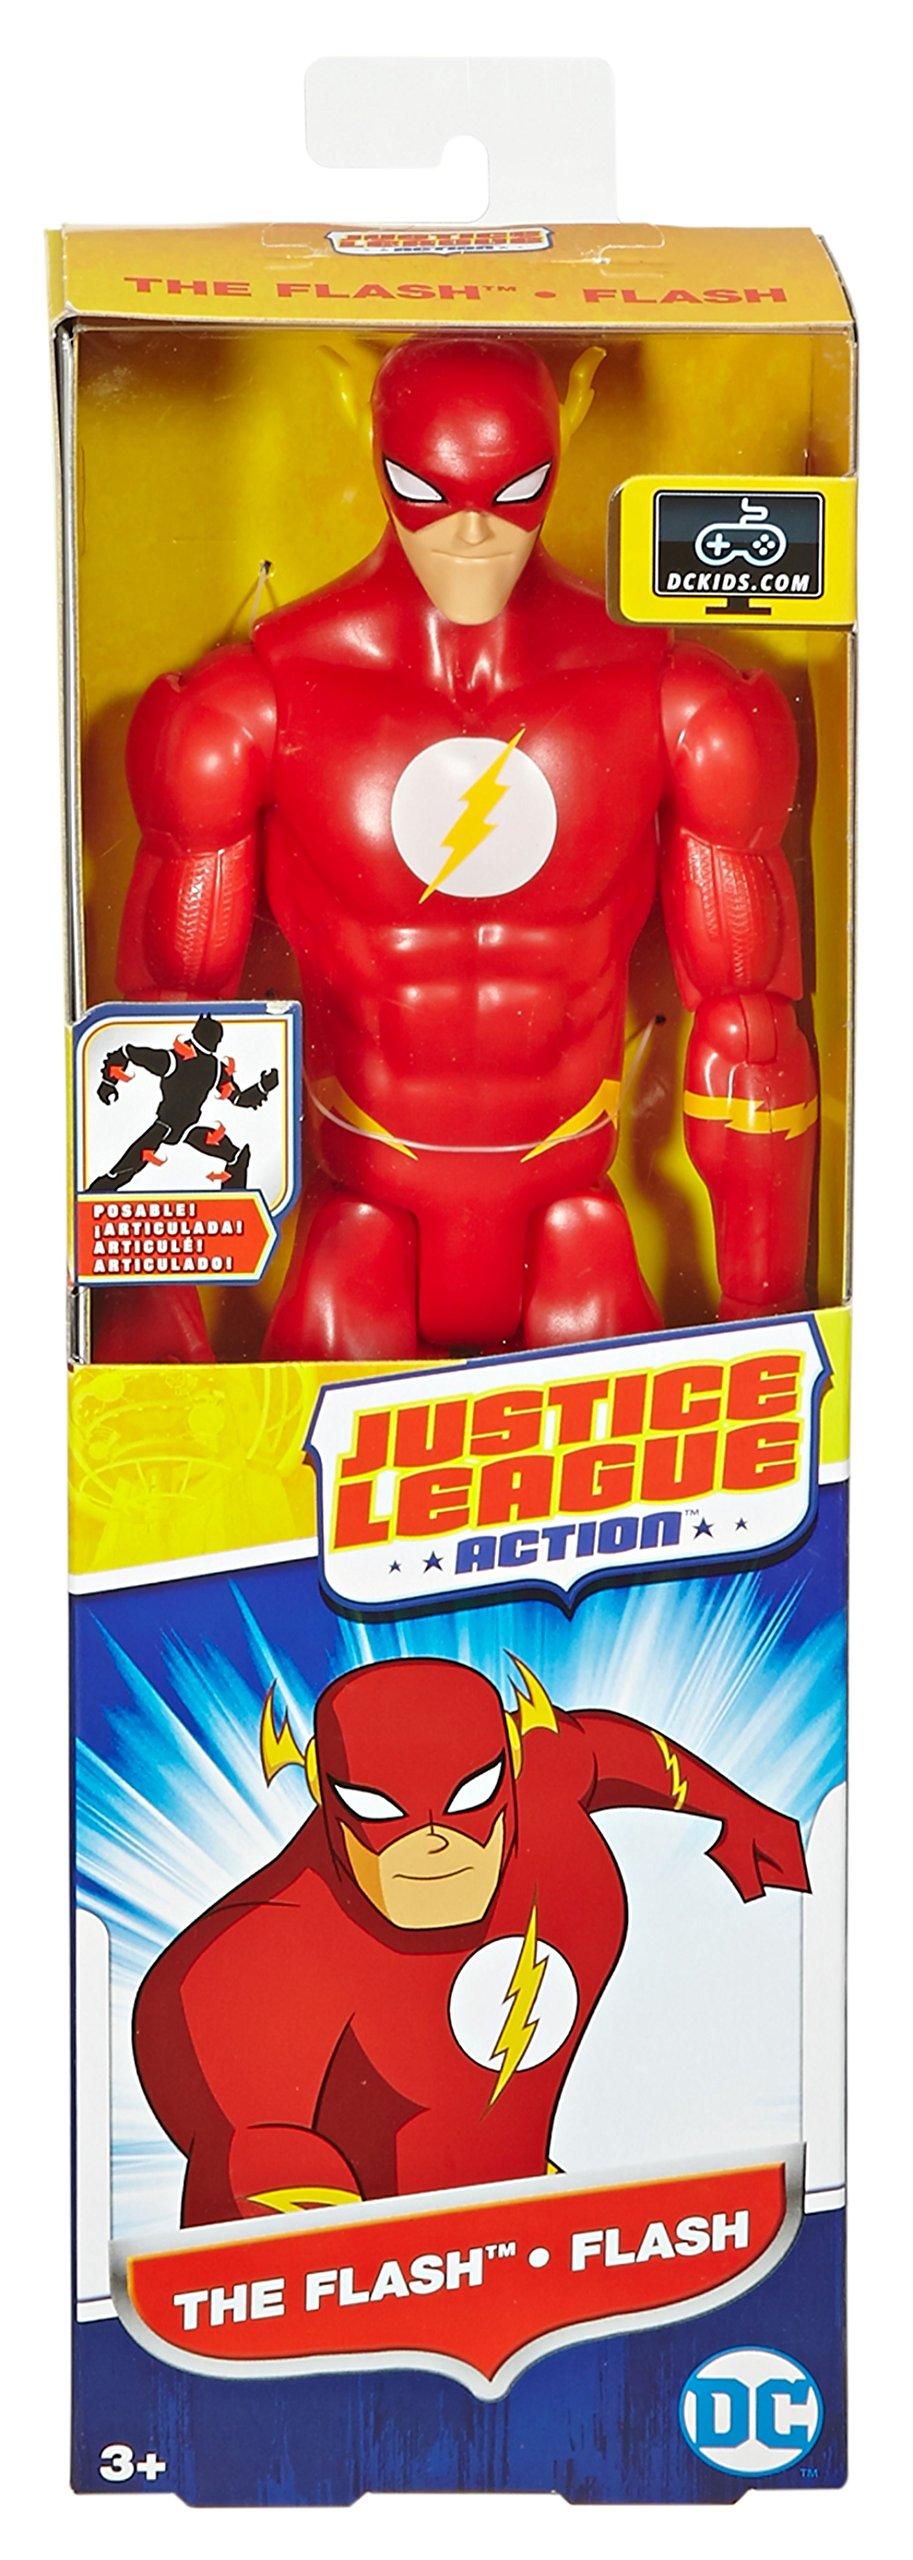 Justice League Action The Flash Figure, 12'' by Mattel (Image #4)